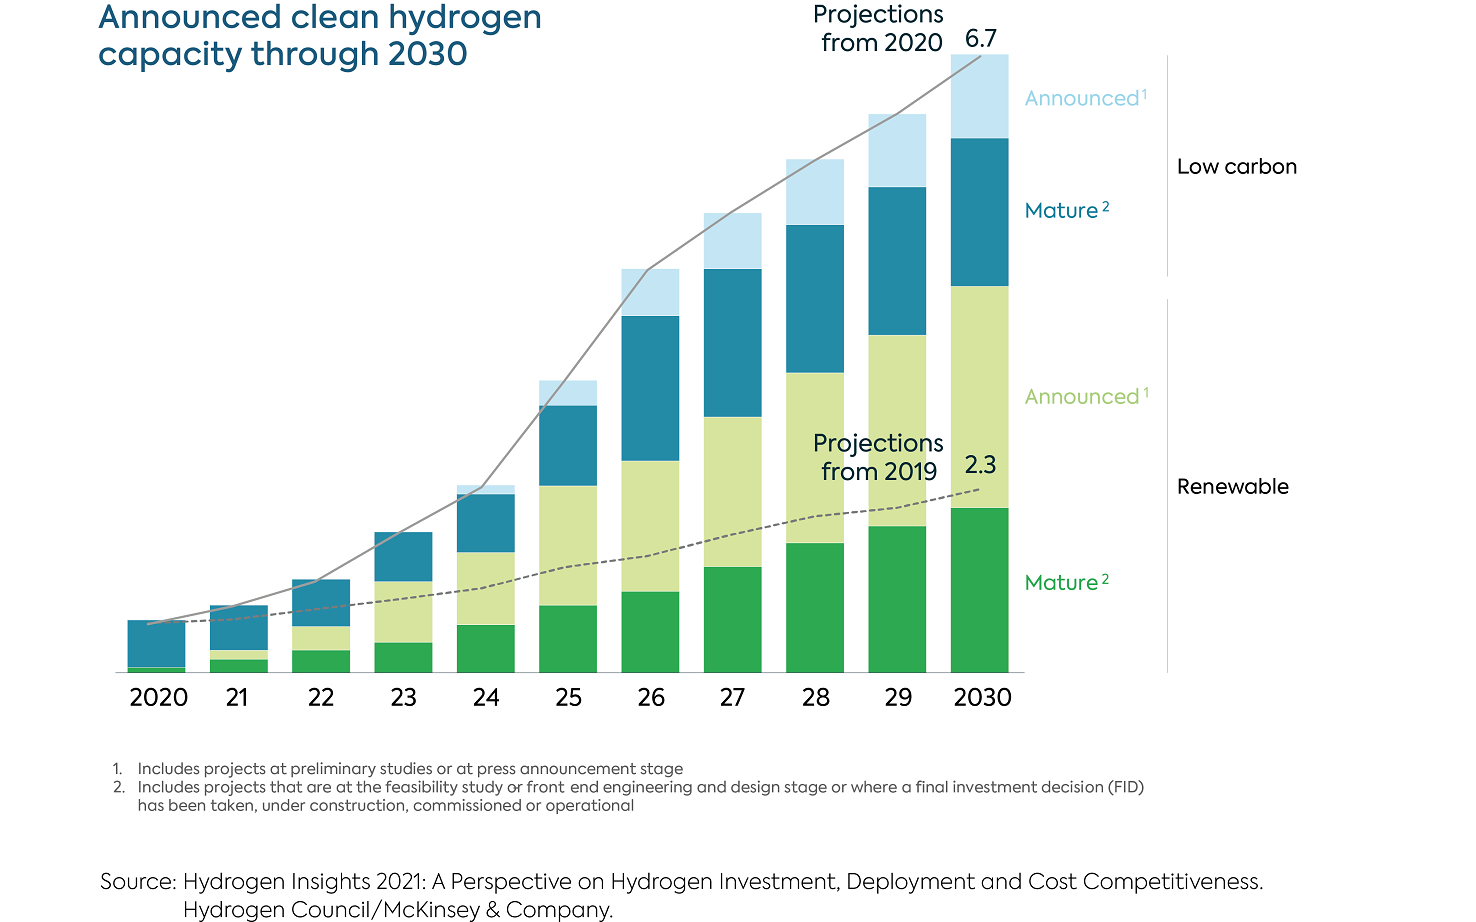 Announced Clean Hydrogen Capacity through 2030